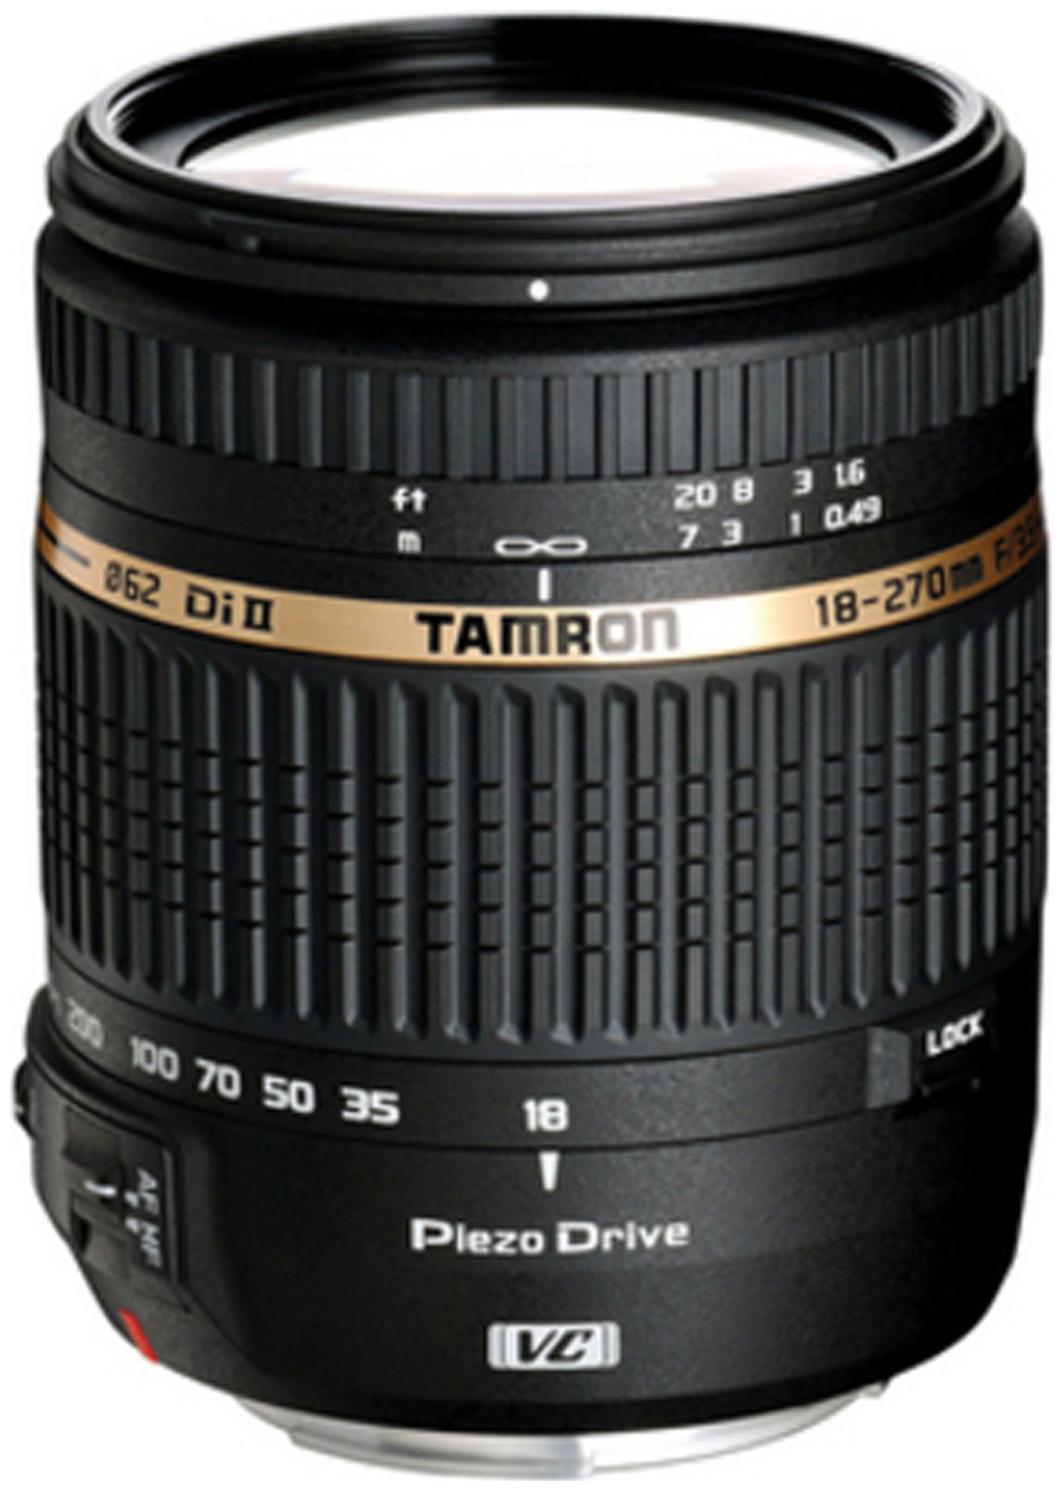 Tamron 18   270 mm F/3.5 6.3 Di II VC PZD w/DA 18 For Nikon Digital SLR Lens  Black